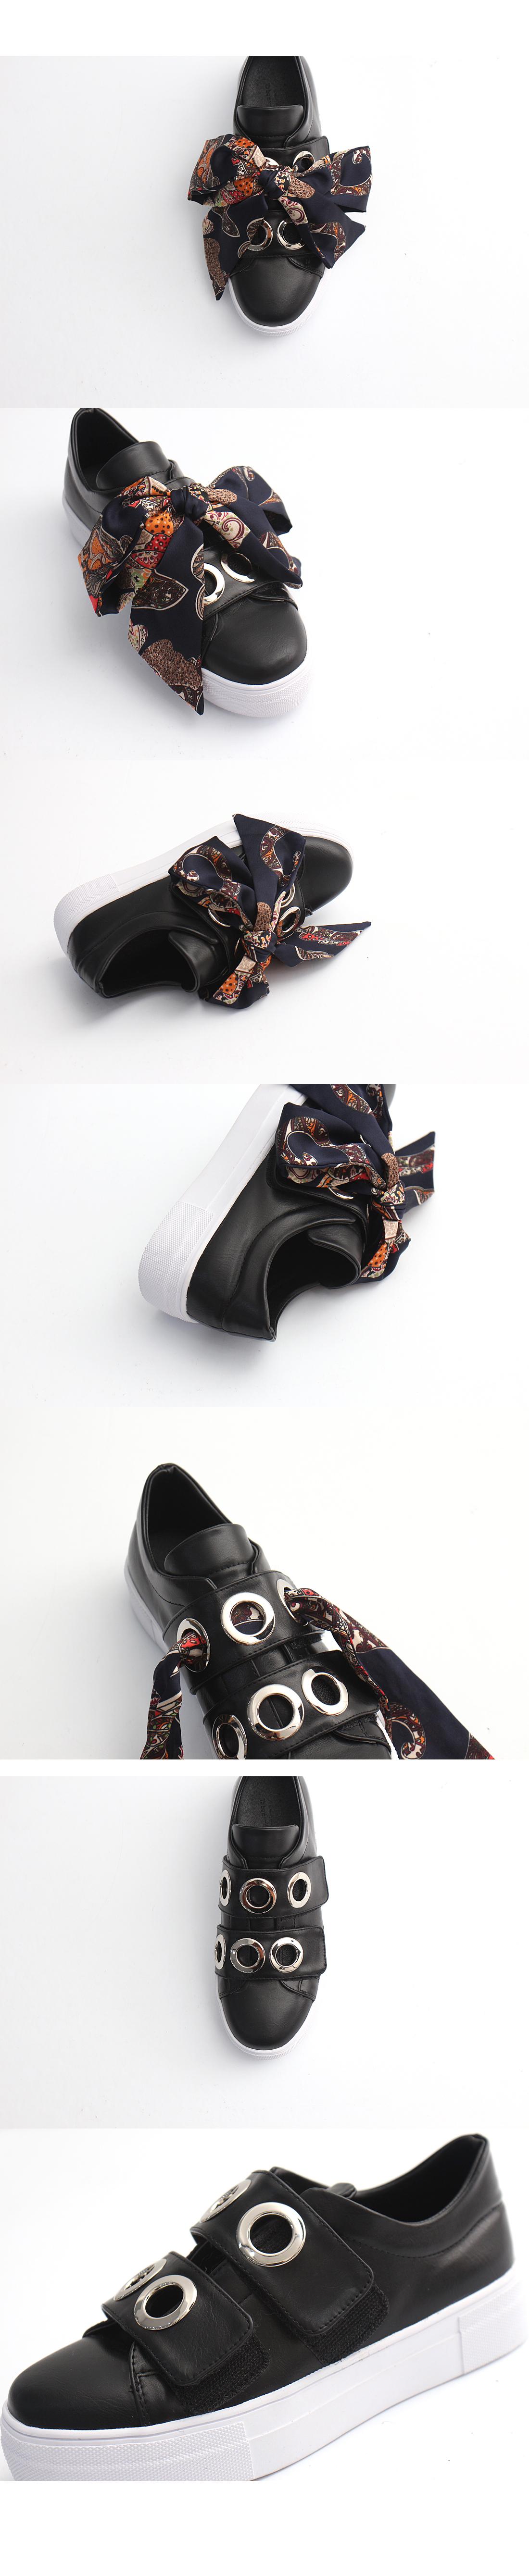 Scarf Velcro Slip-On